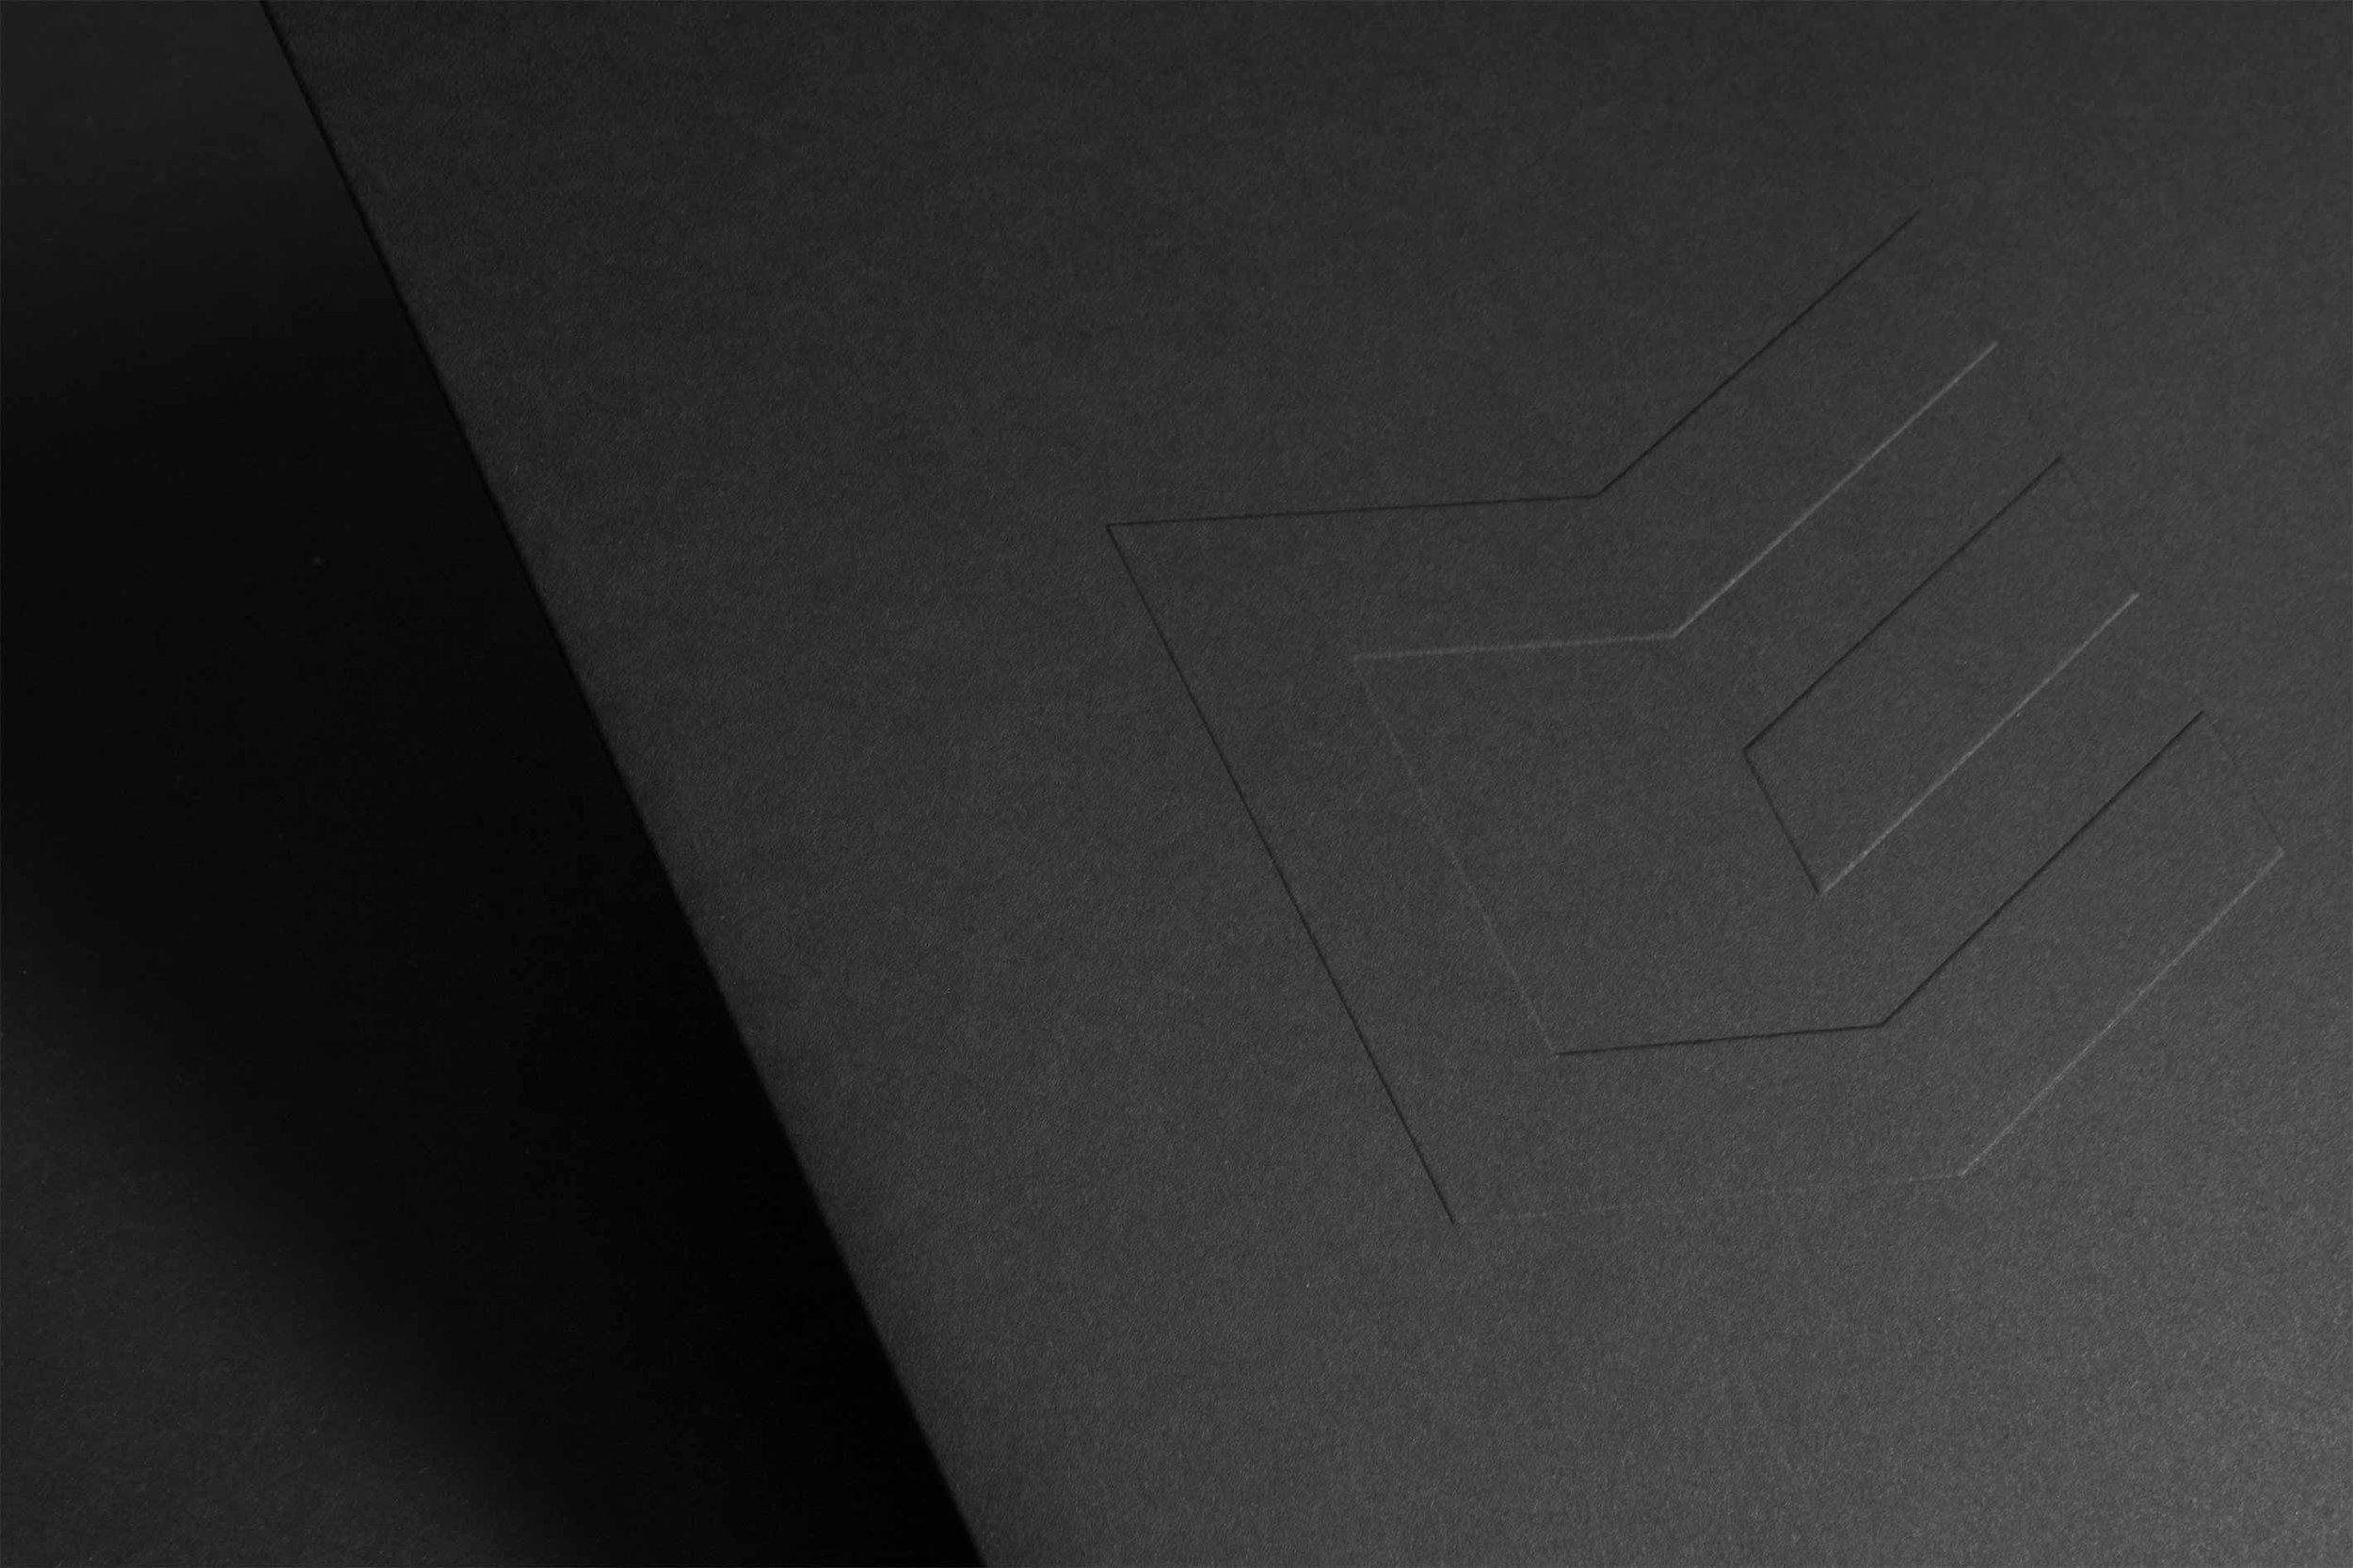 Figure-Jeremy-Hall-Design-Graphique-Quebec-Logo-Branding-Image-De-Marque-Item-Construction-14.jpg